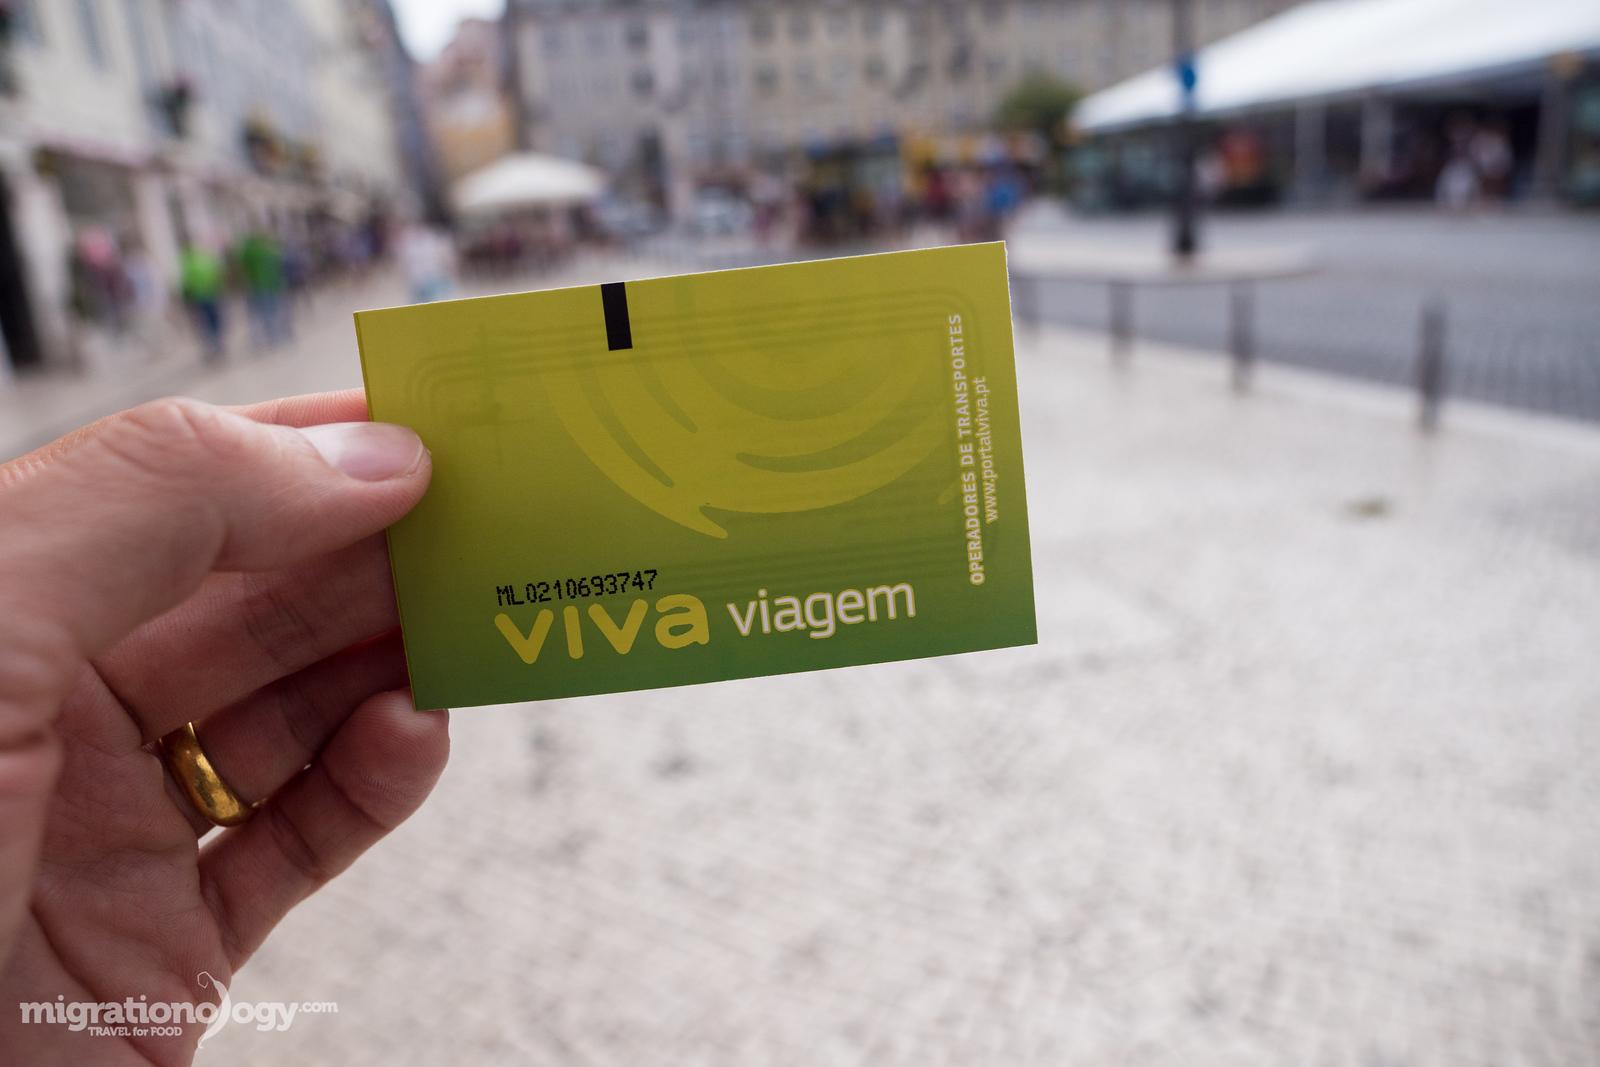 Viva Viagem card